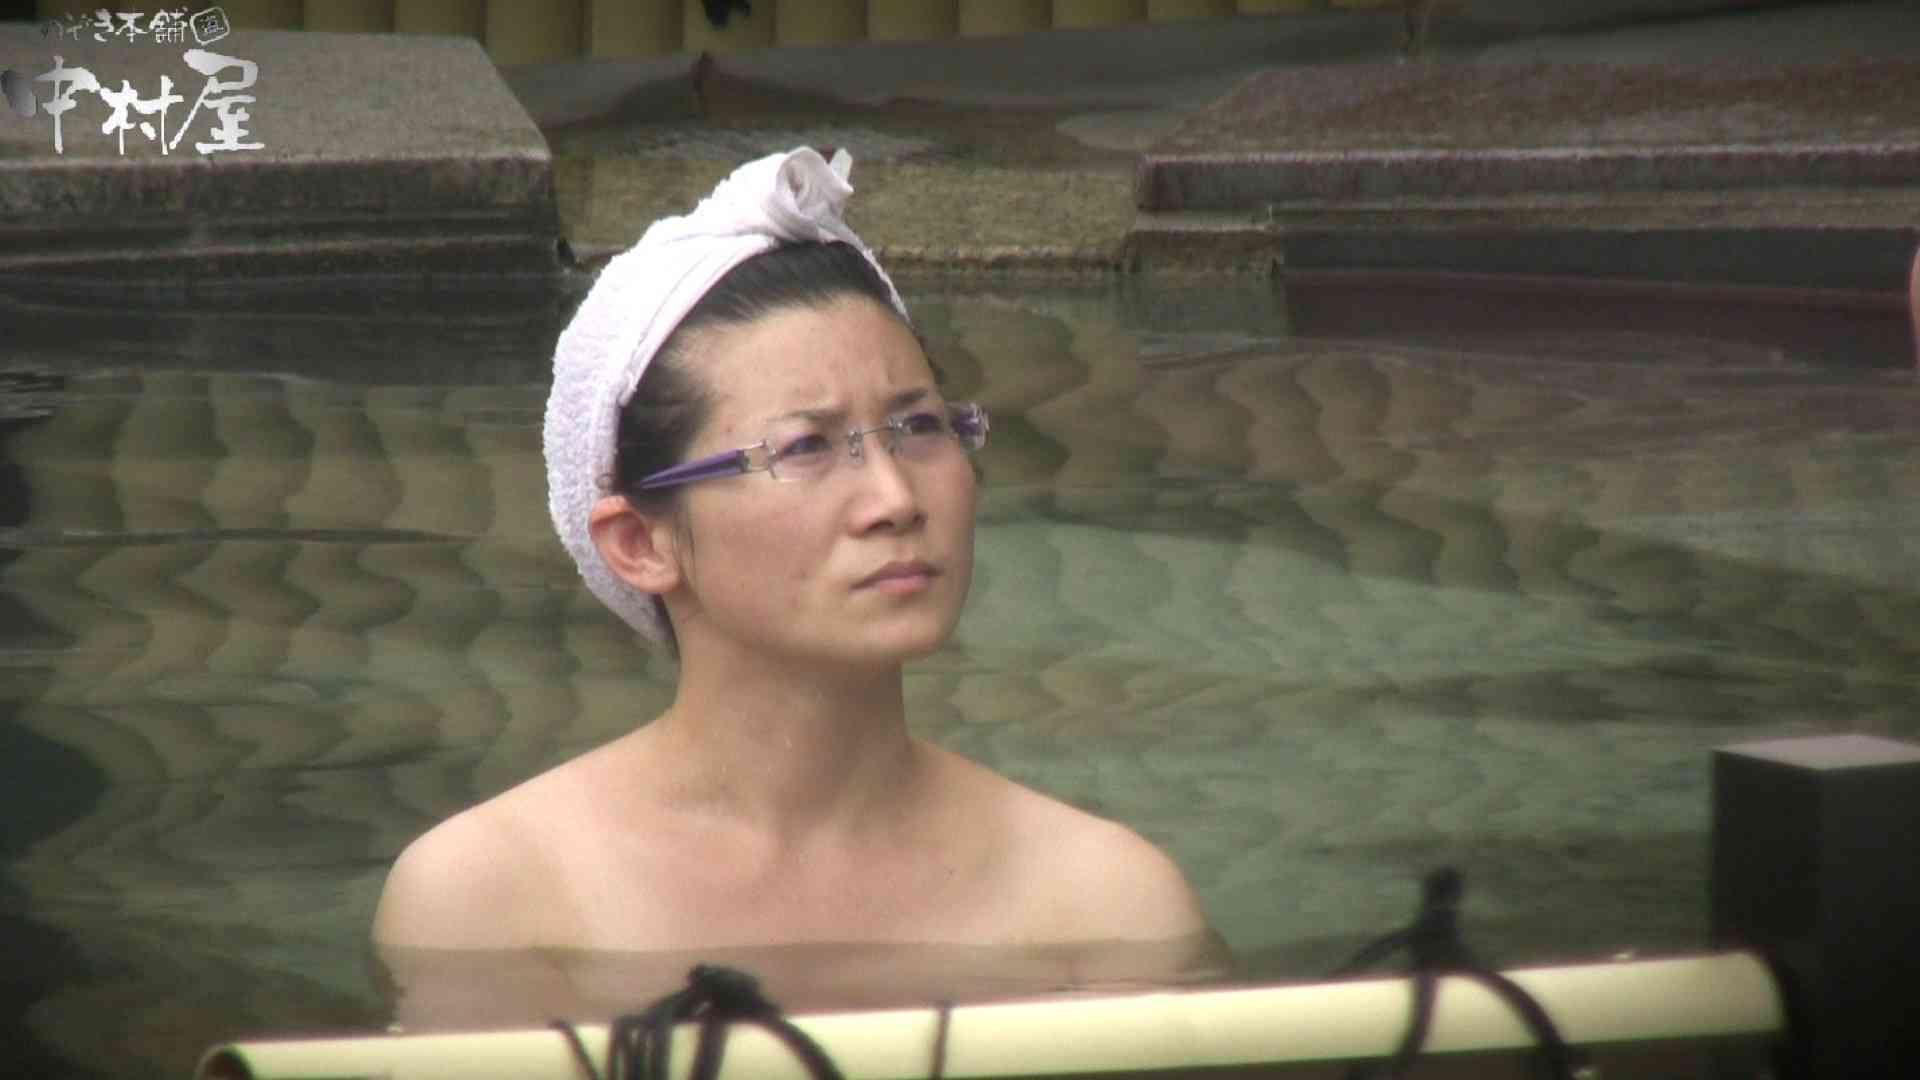 Aquaな露天風呂Vol.905 盗撮 ワレメ動画紹介 99連発 35